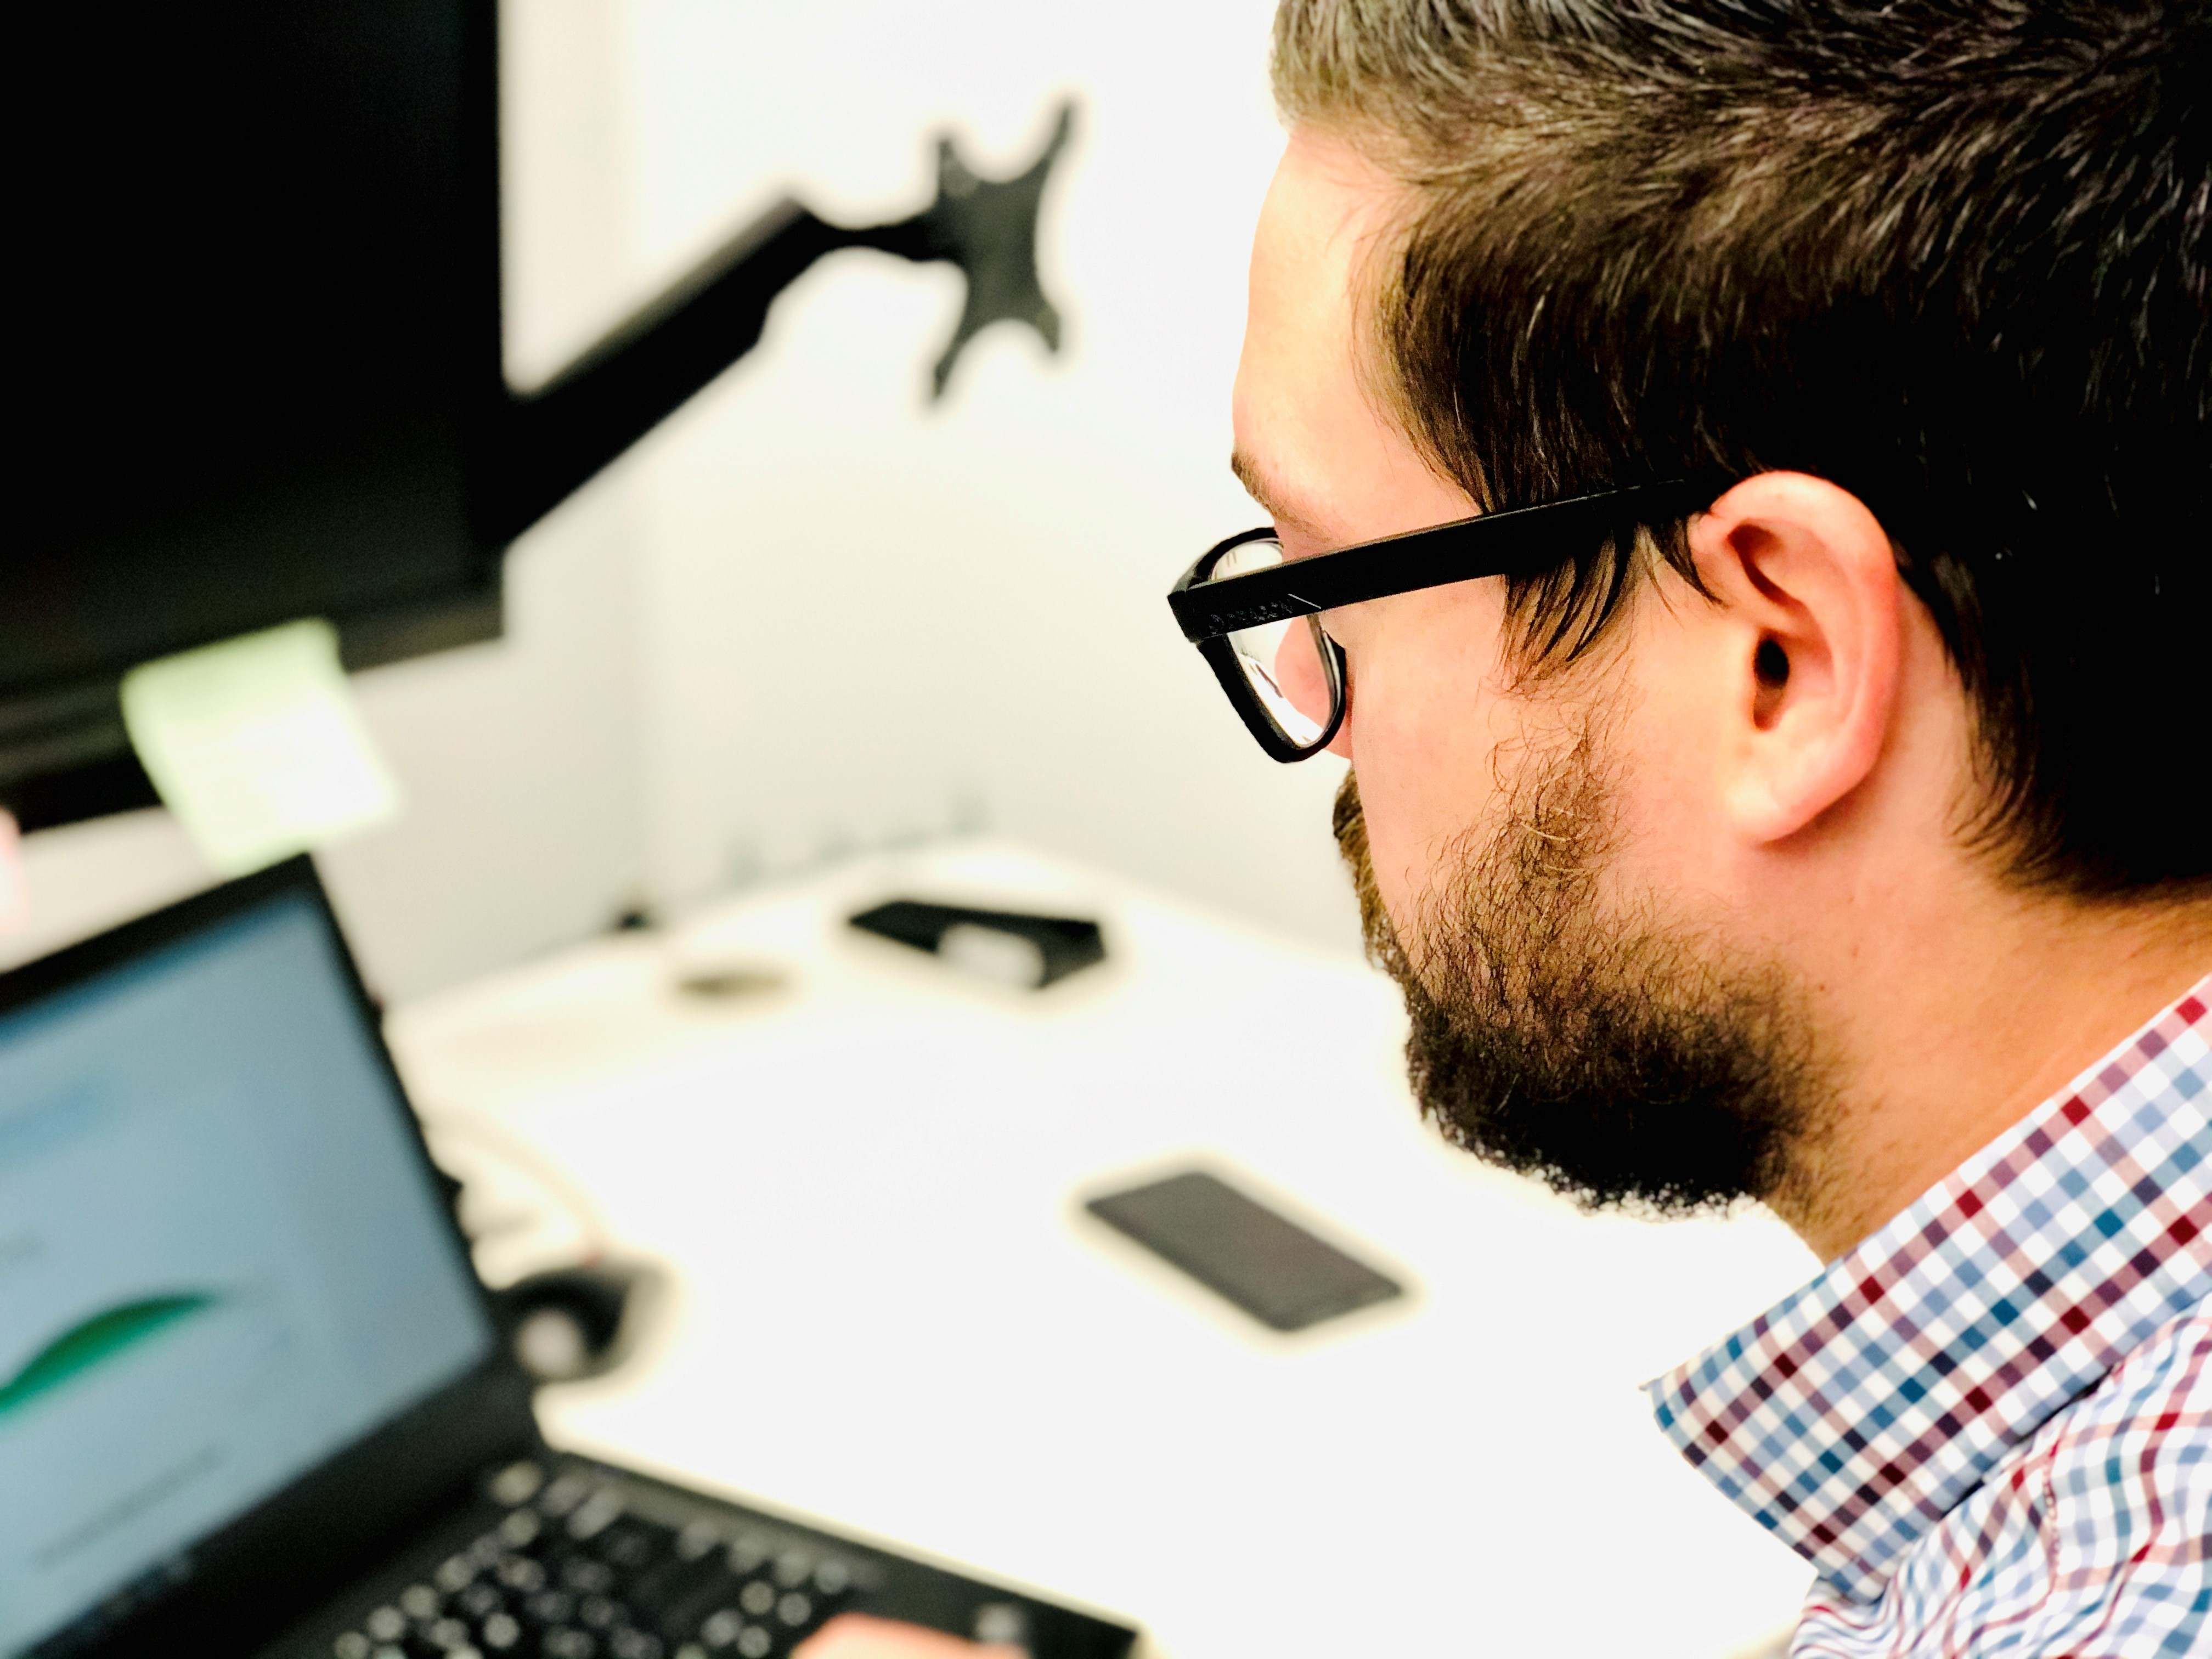 Net Friends team member Cody doing work on his laptop